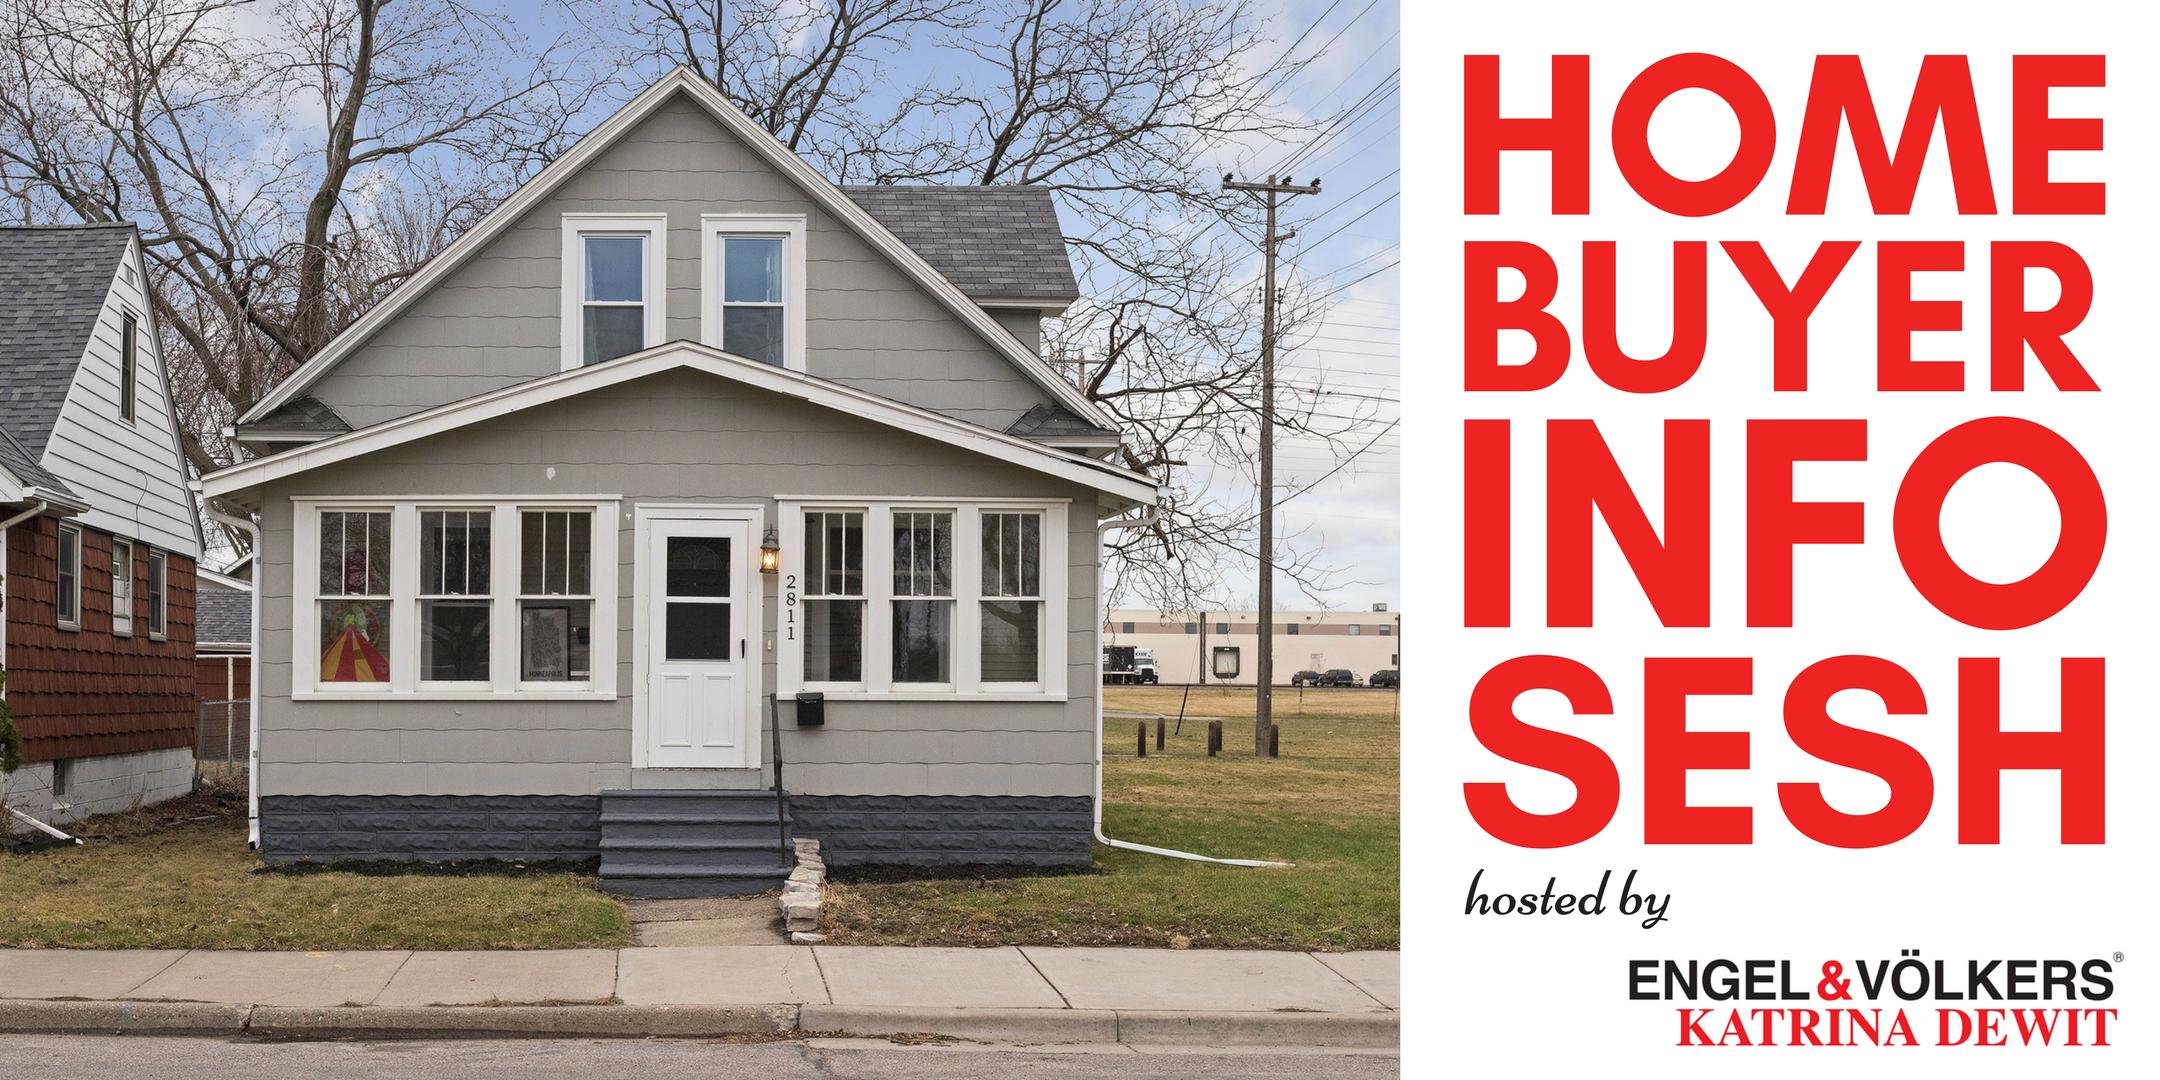 Home Buyer Info Sesh